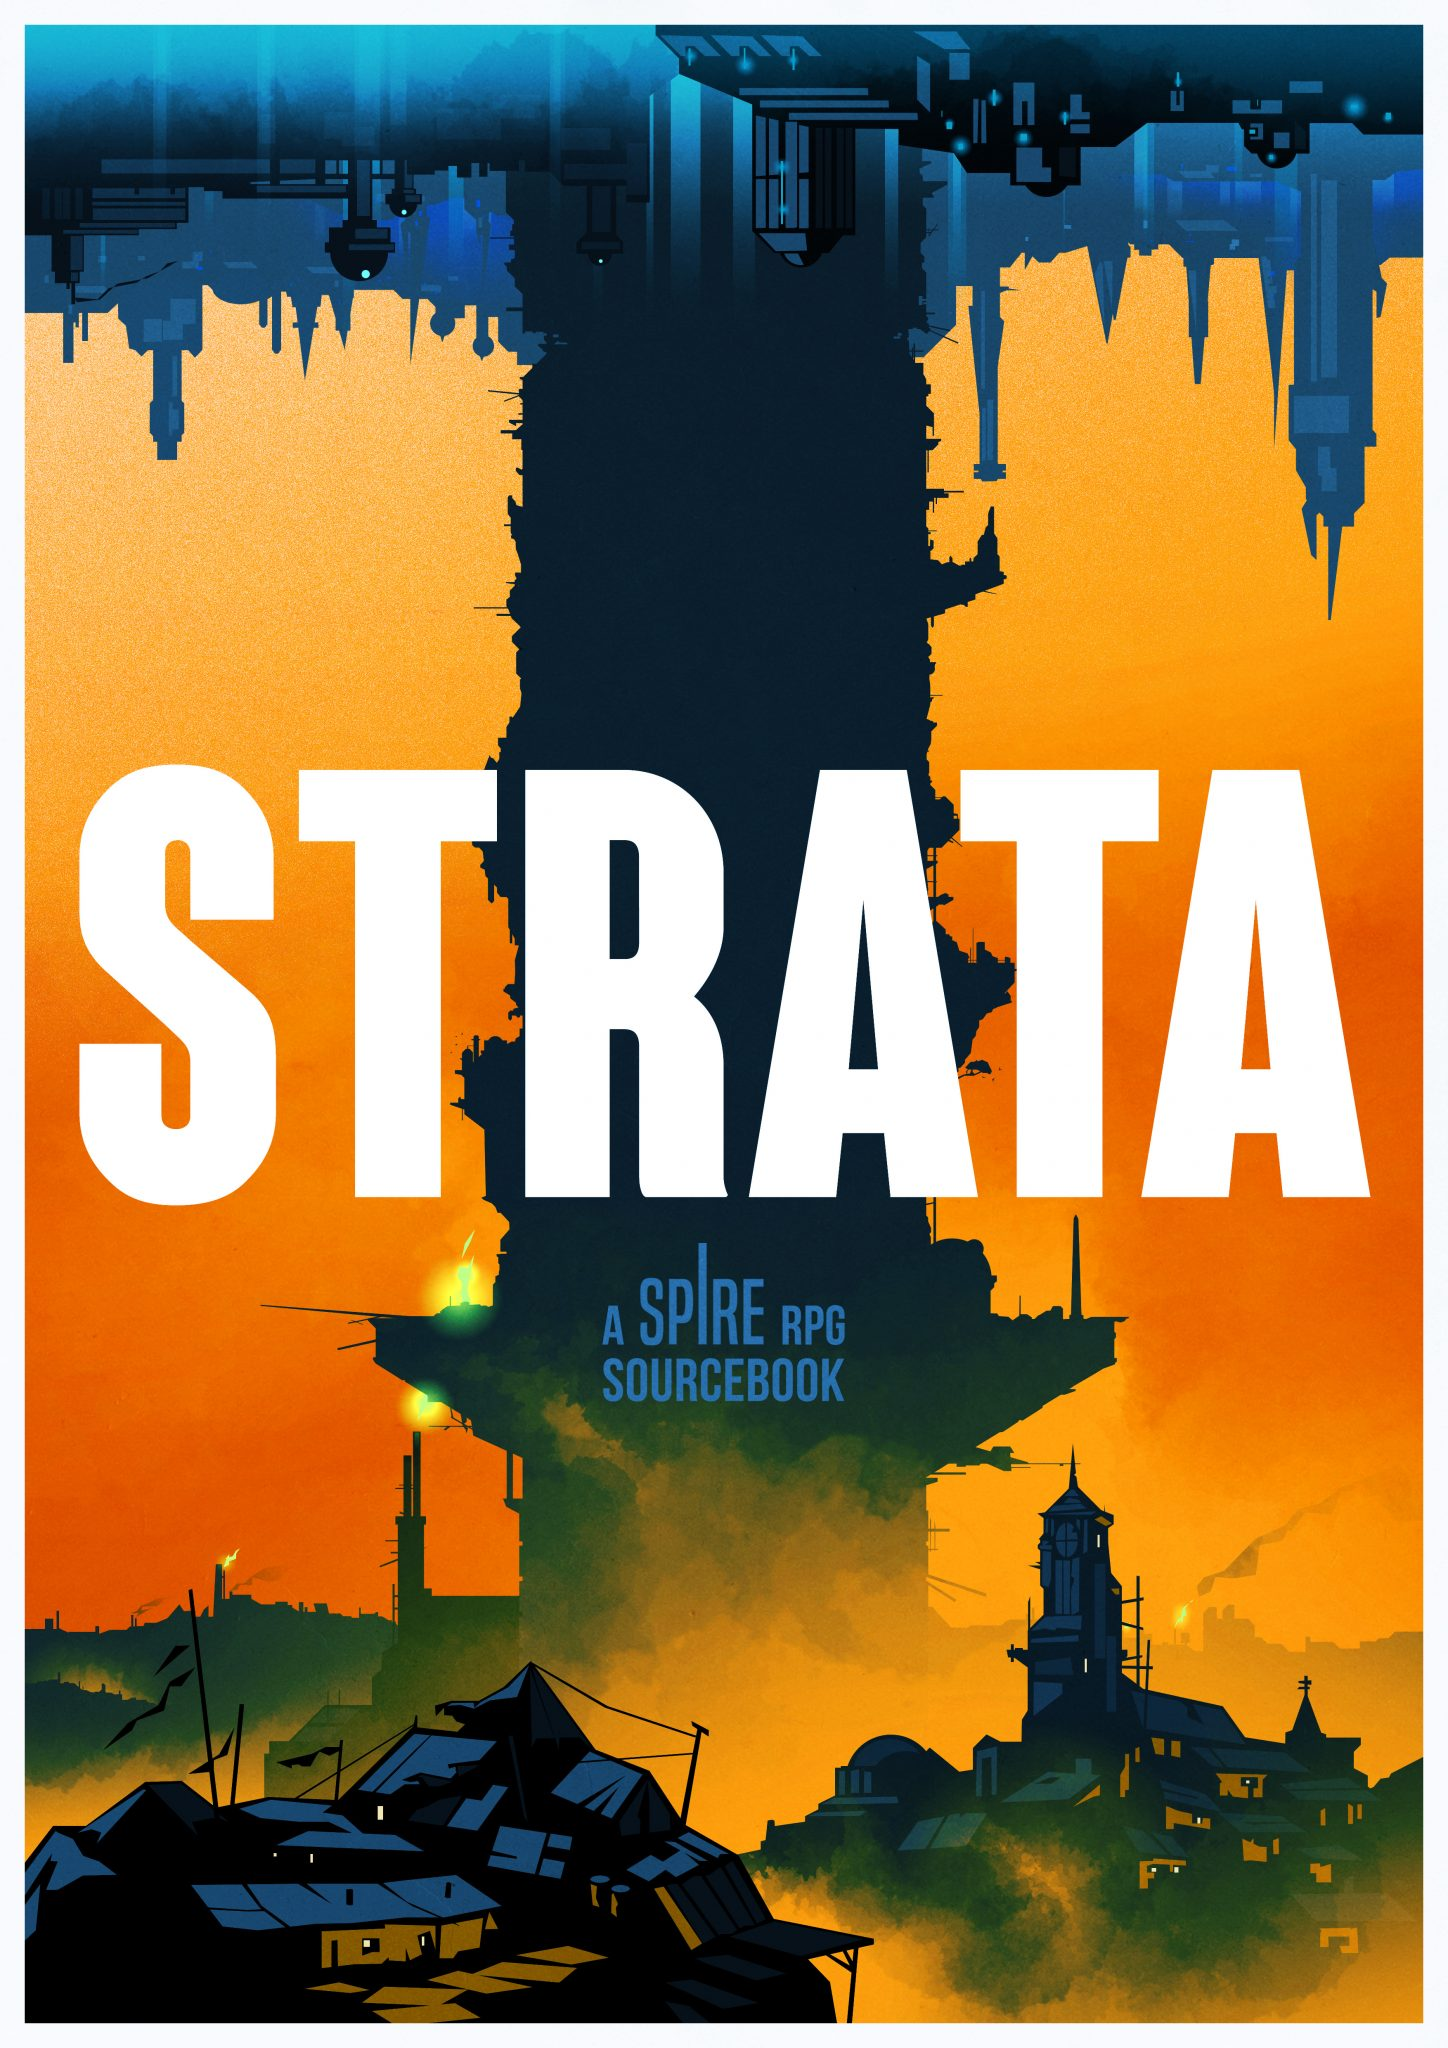 Strata Source: Spire RPG -  Rowan, Rook and Decard Ltd